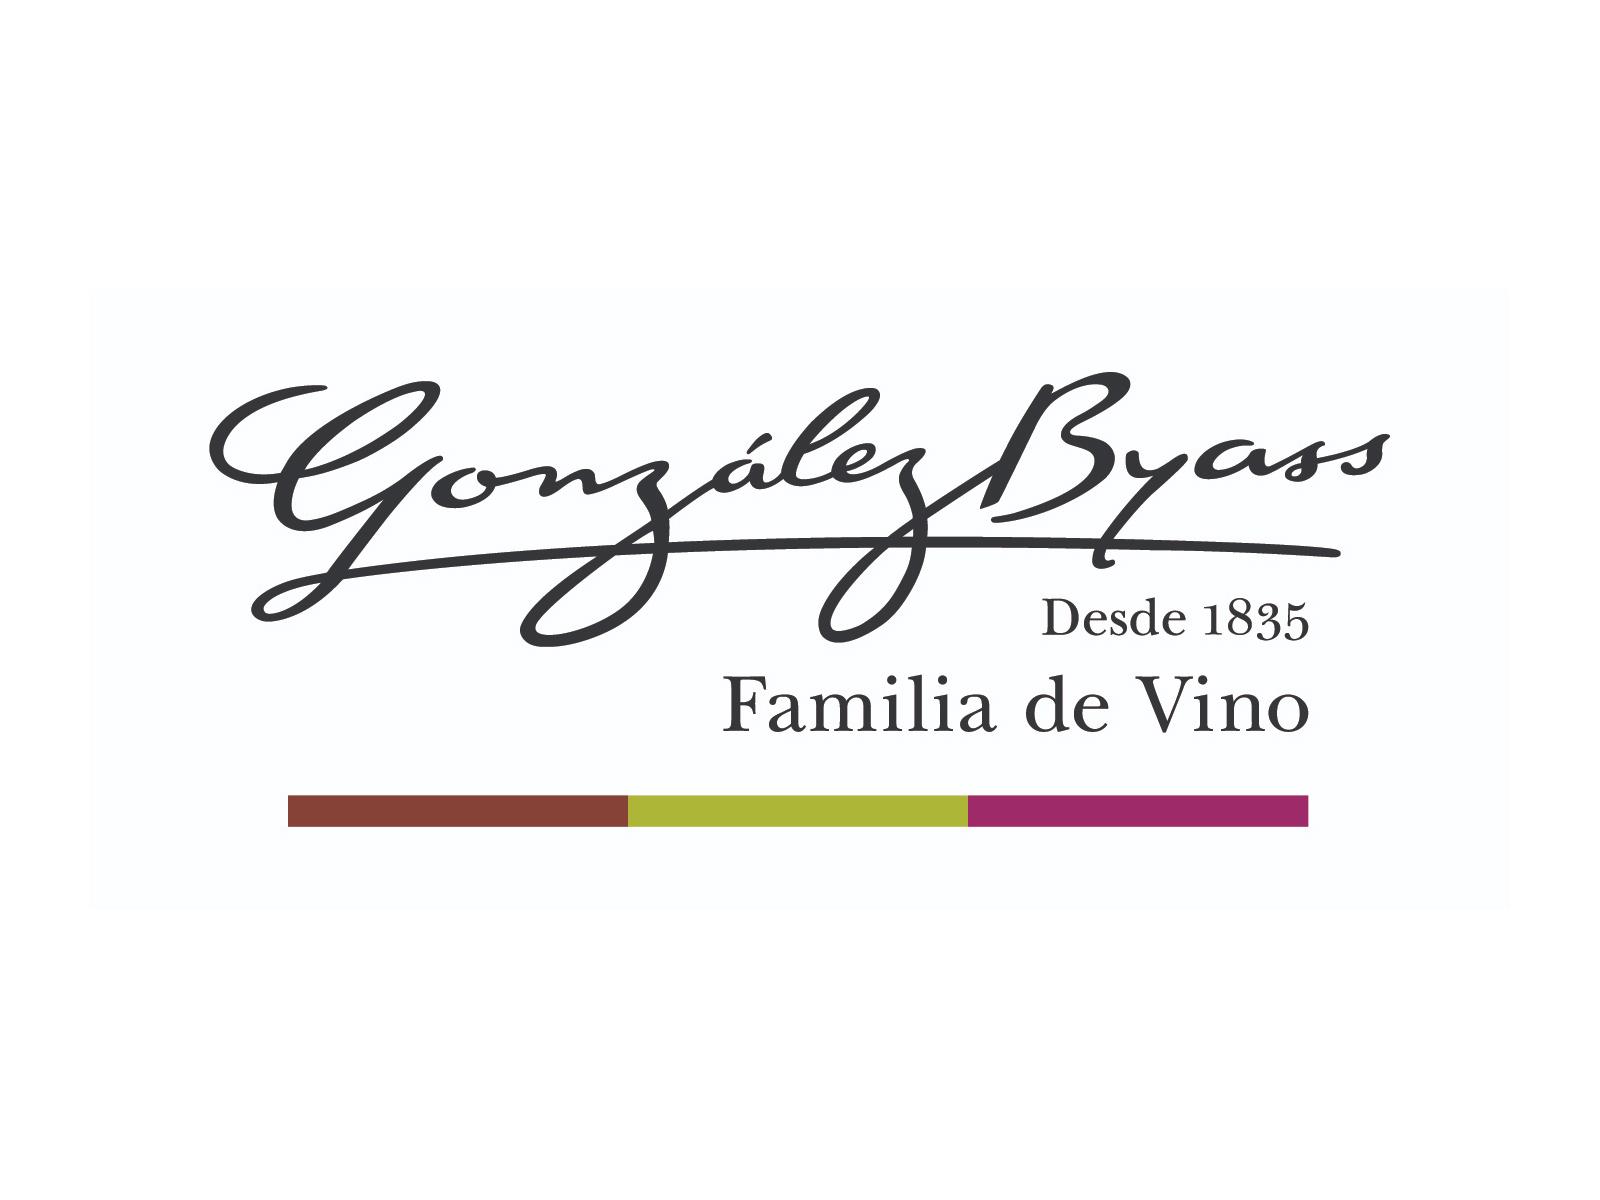 Gonzalez Byass Sherry Tasting